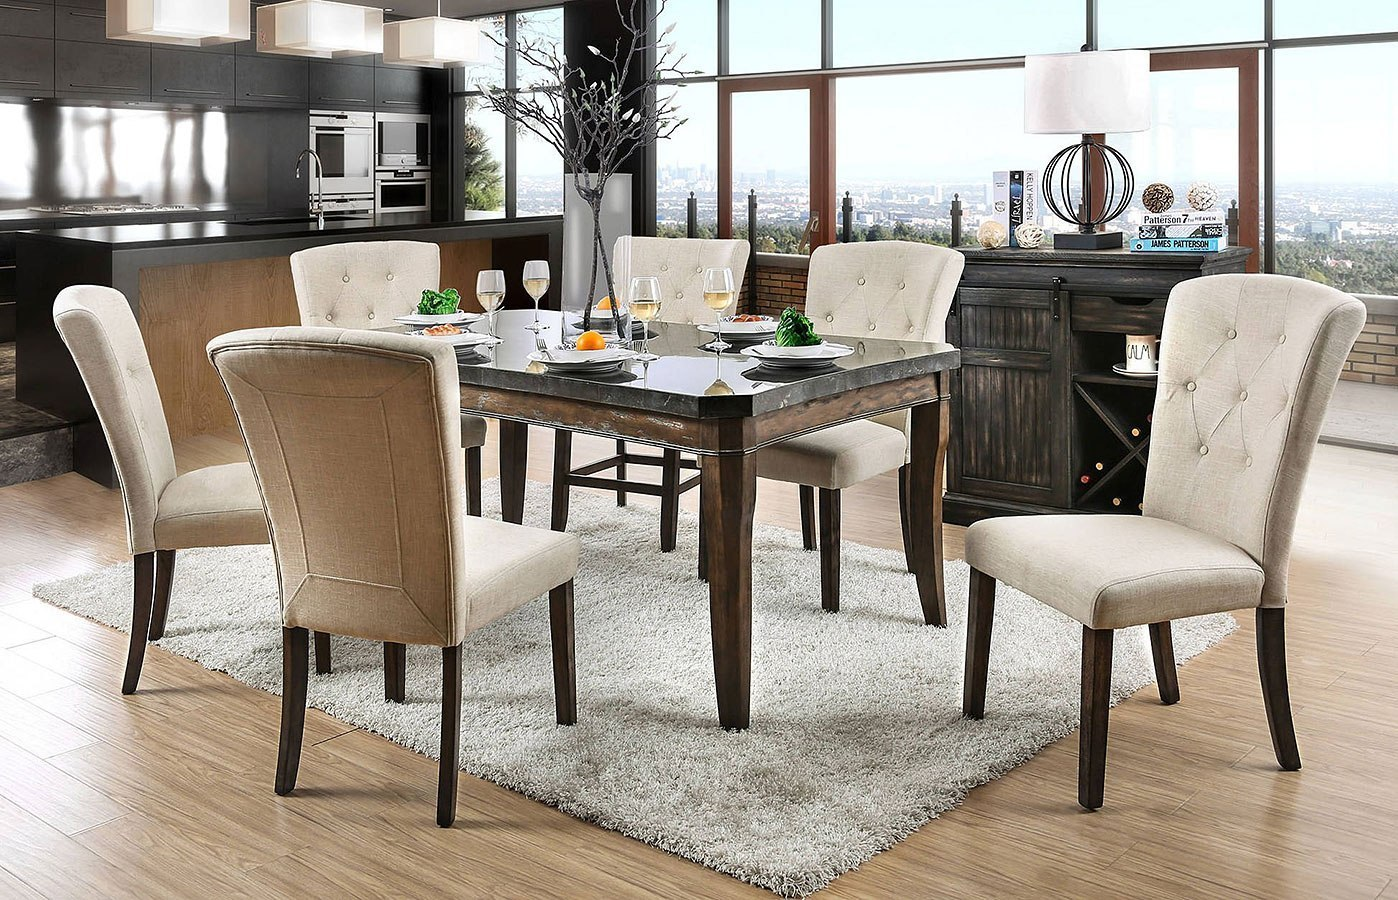 Schoten Dining Room Set W/ Ivory Chairs